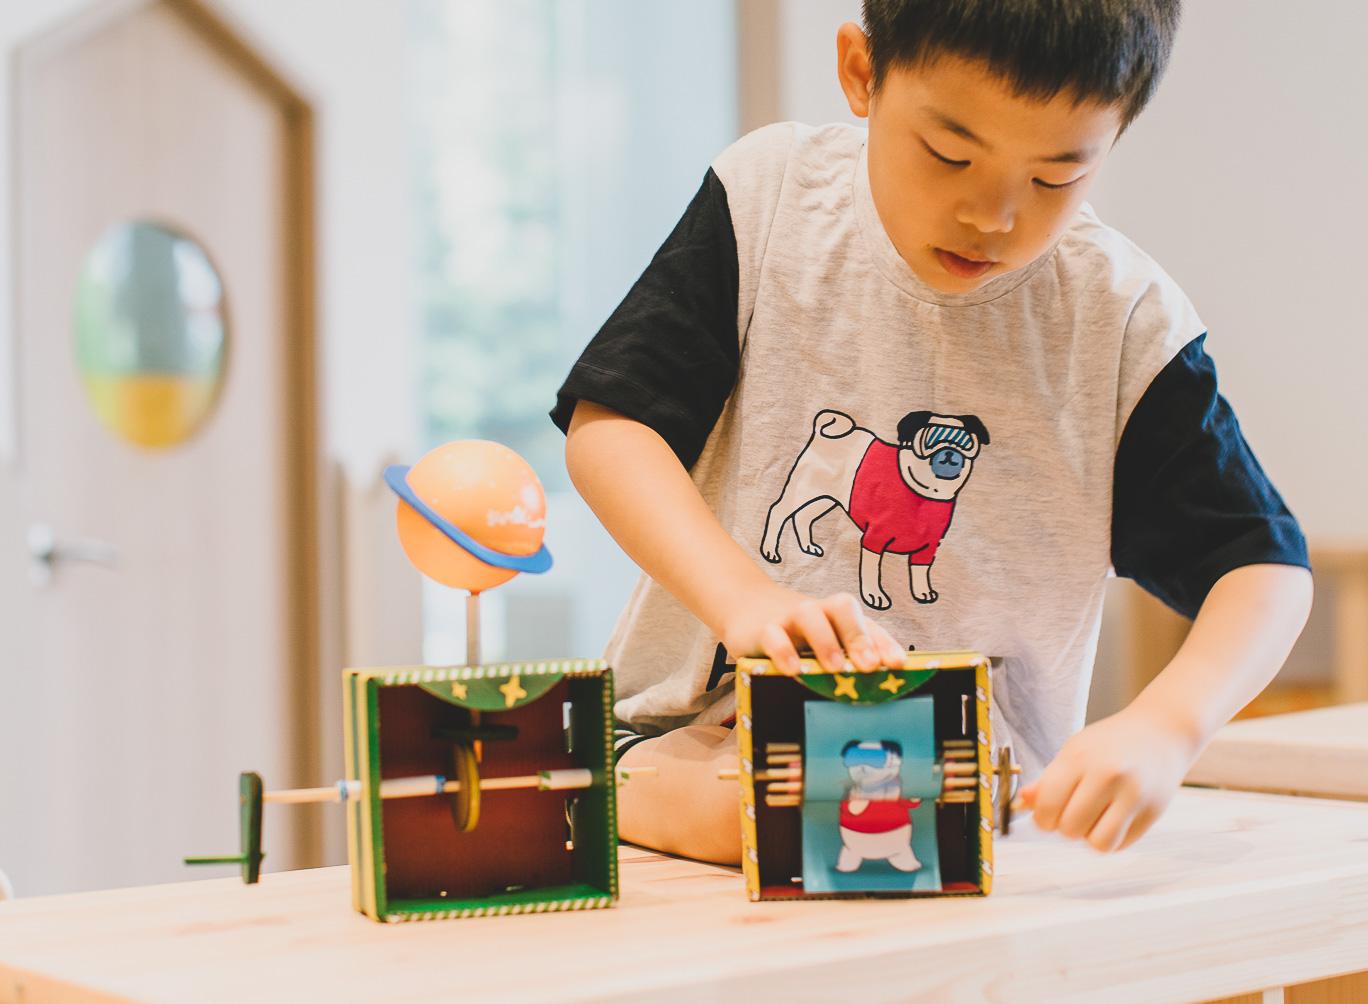 A kid is playing with a handmade thaumatrope machine animating a cartoon pug.